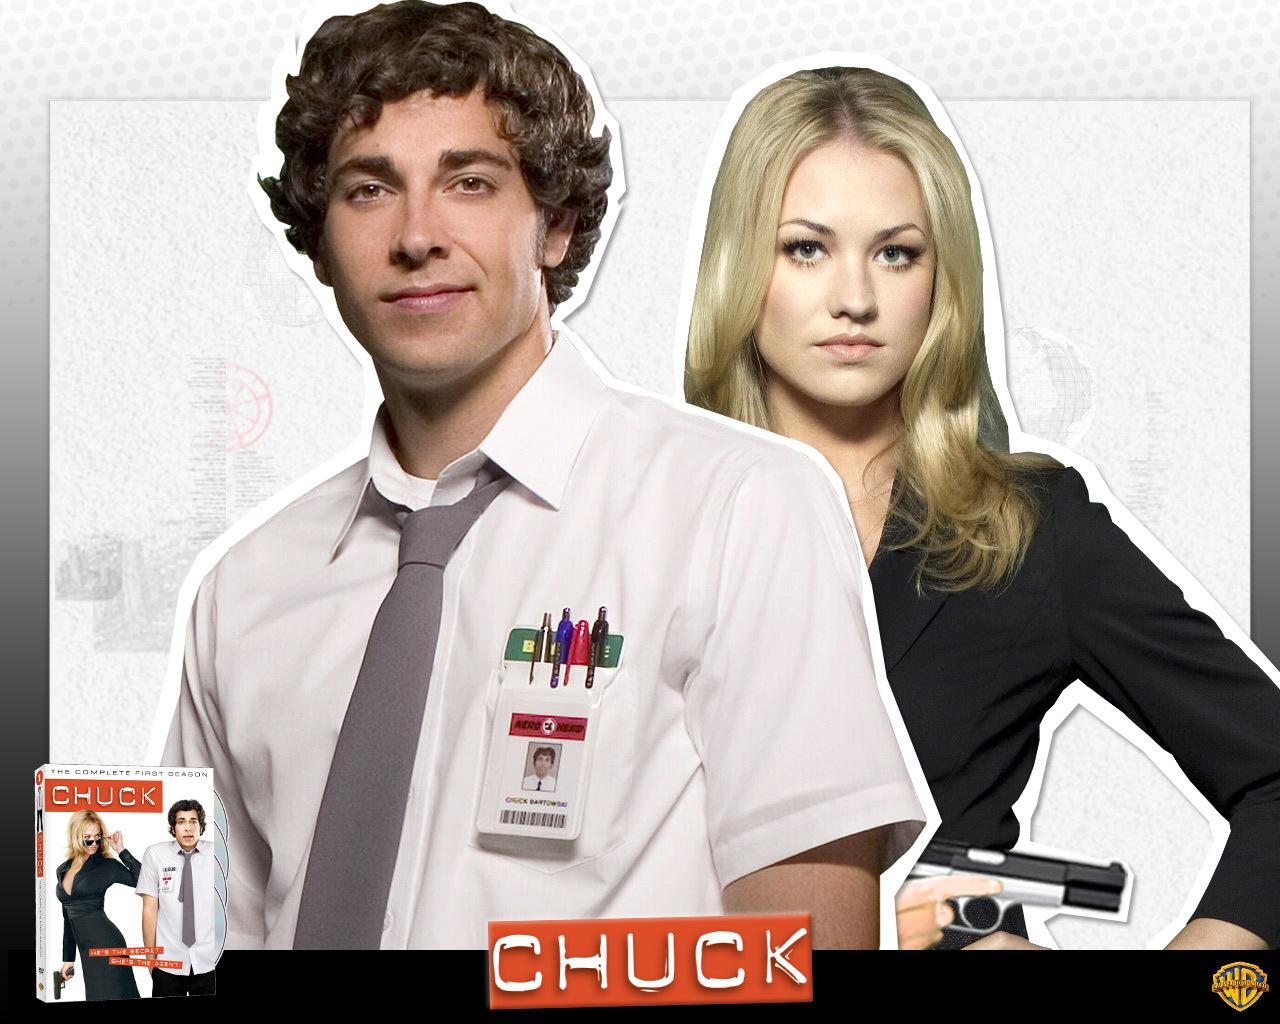 Serie Chuck